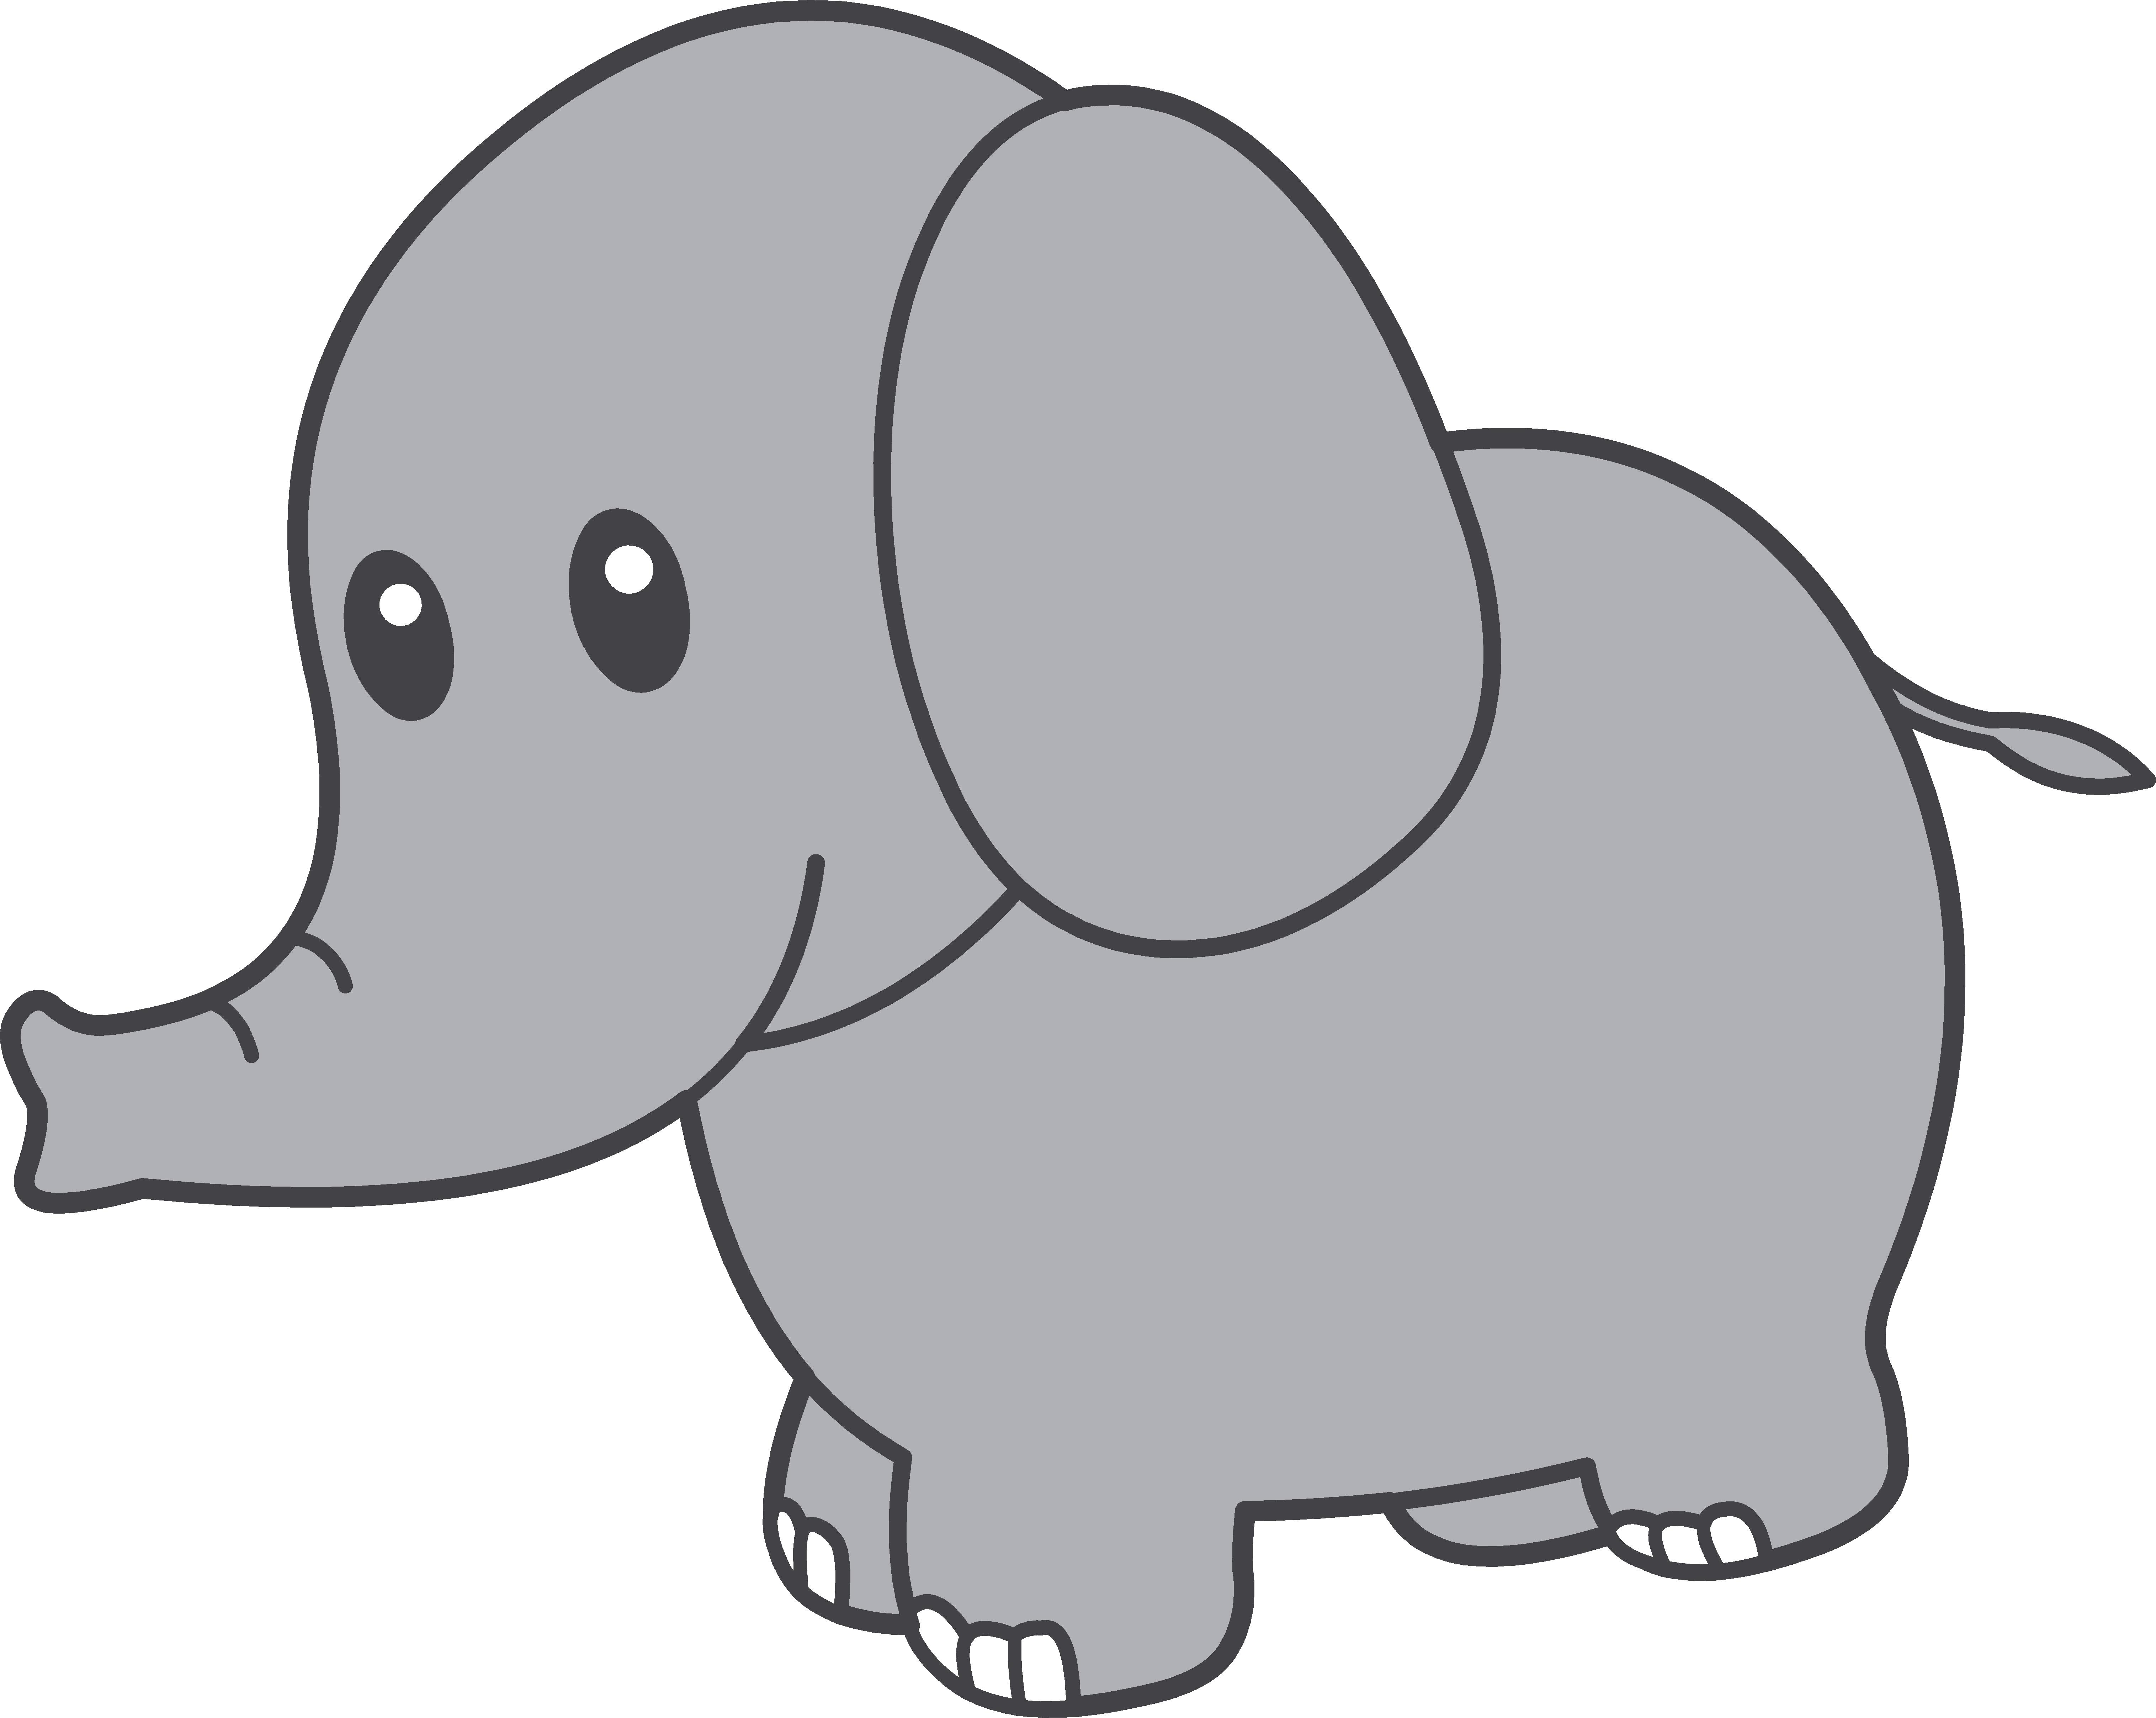 Cartoon Elephant Outline - ClipArt Best